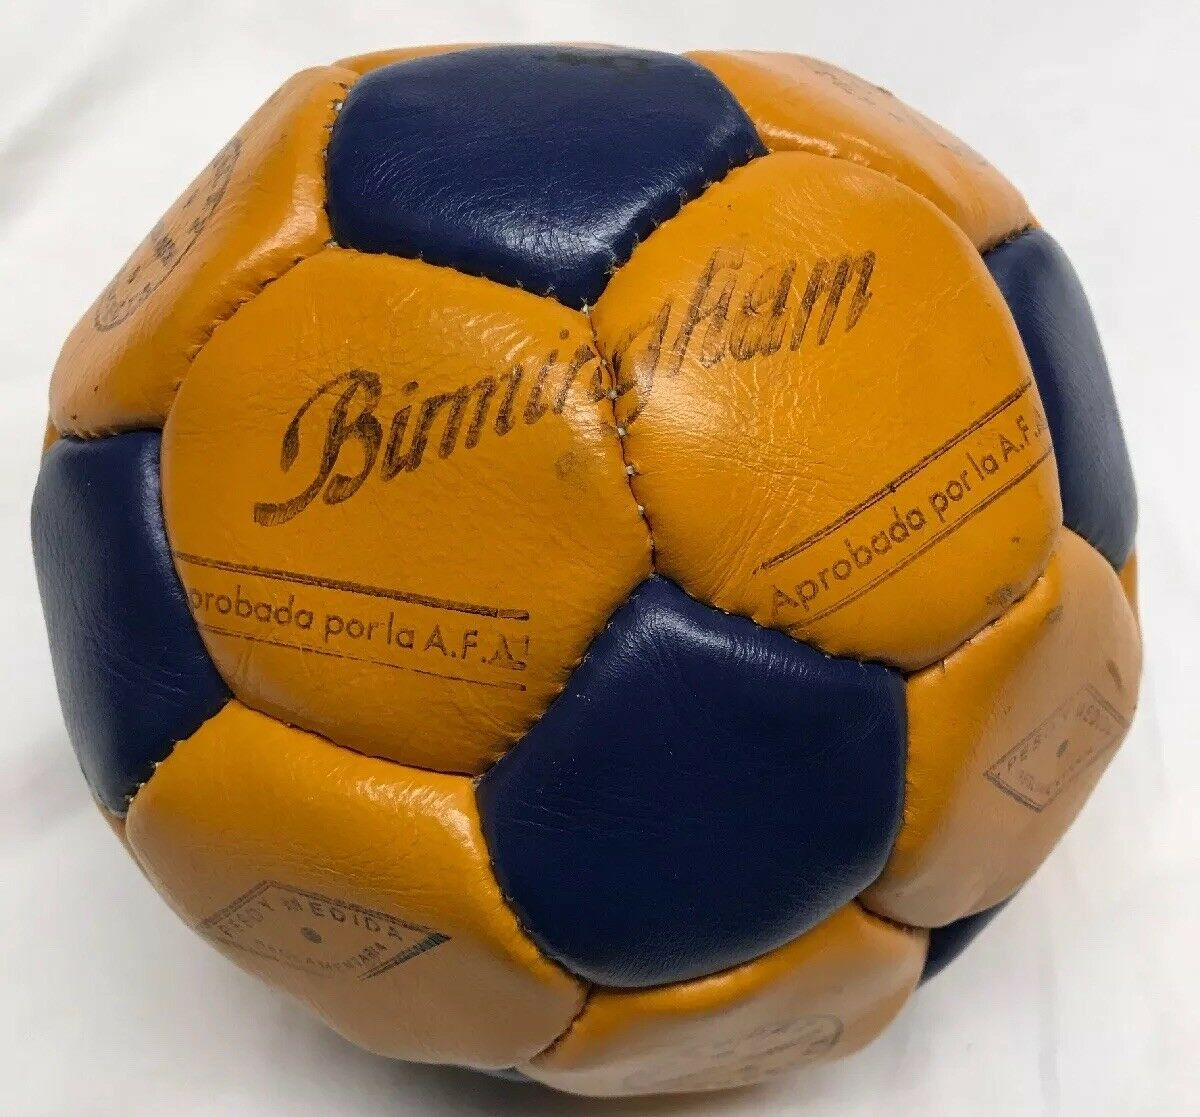 Vintage Leder Soccer Ball Possibly Argentina Football Association Birmingham